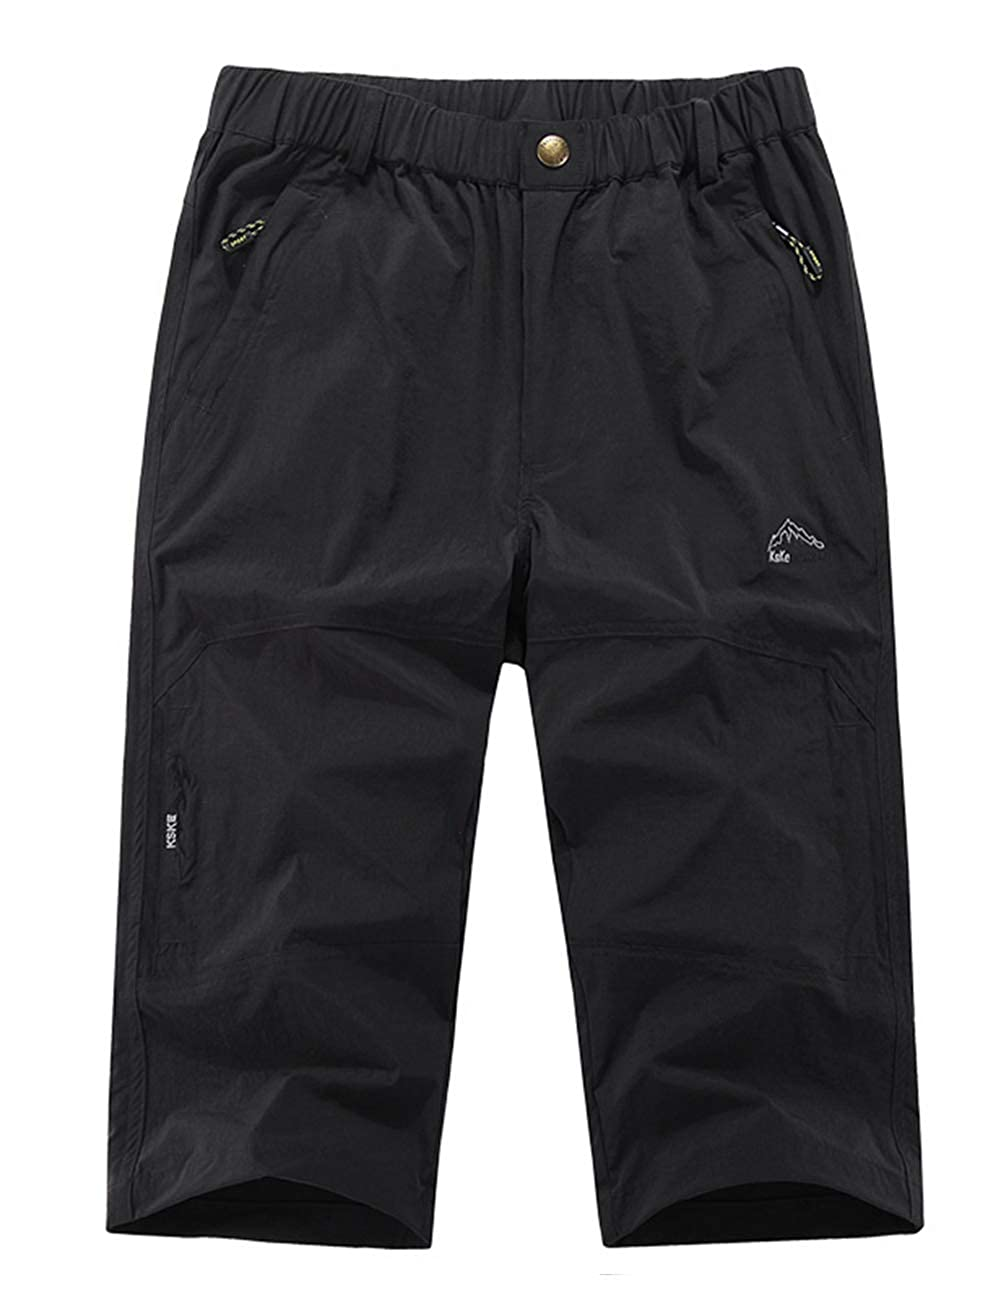 MAGCOMSEN Mens Capri Pants Elastic Knee Length Shorts 3//4 Shorts Quick Dry Multi-Pockets Cargo Capri Shorts